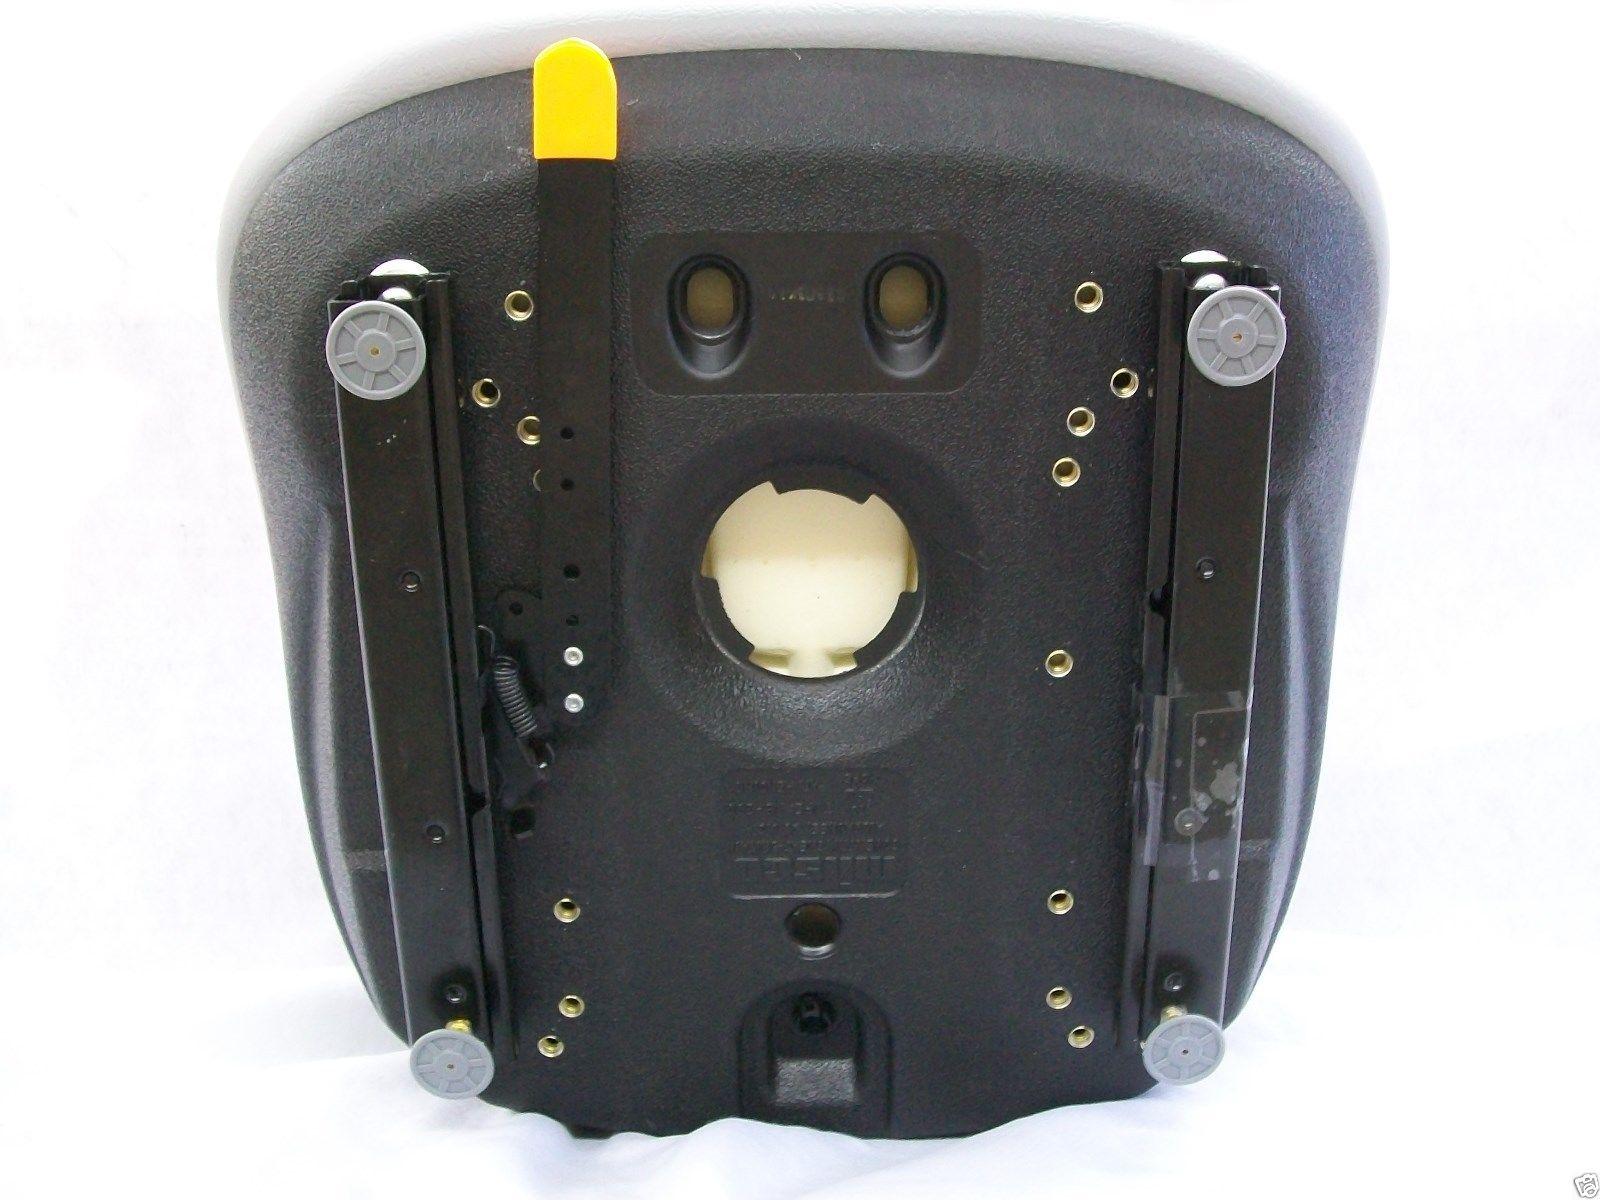 GRAY CASE SKID STEER SEAT 410, 420, 420CT, 430, 435, 440, 440CT, 445,  445CT, 450, 450CT, 465, 1530, 1816, 1818, 1825, 1830, 1835, 1835B, 1835C,  1838,